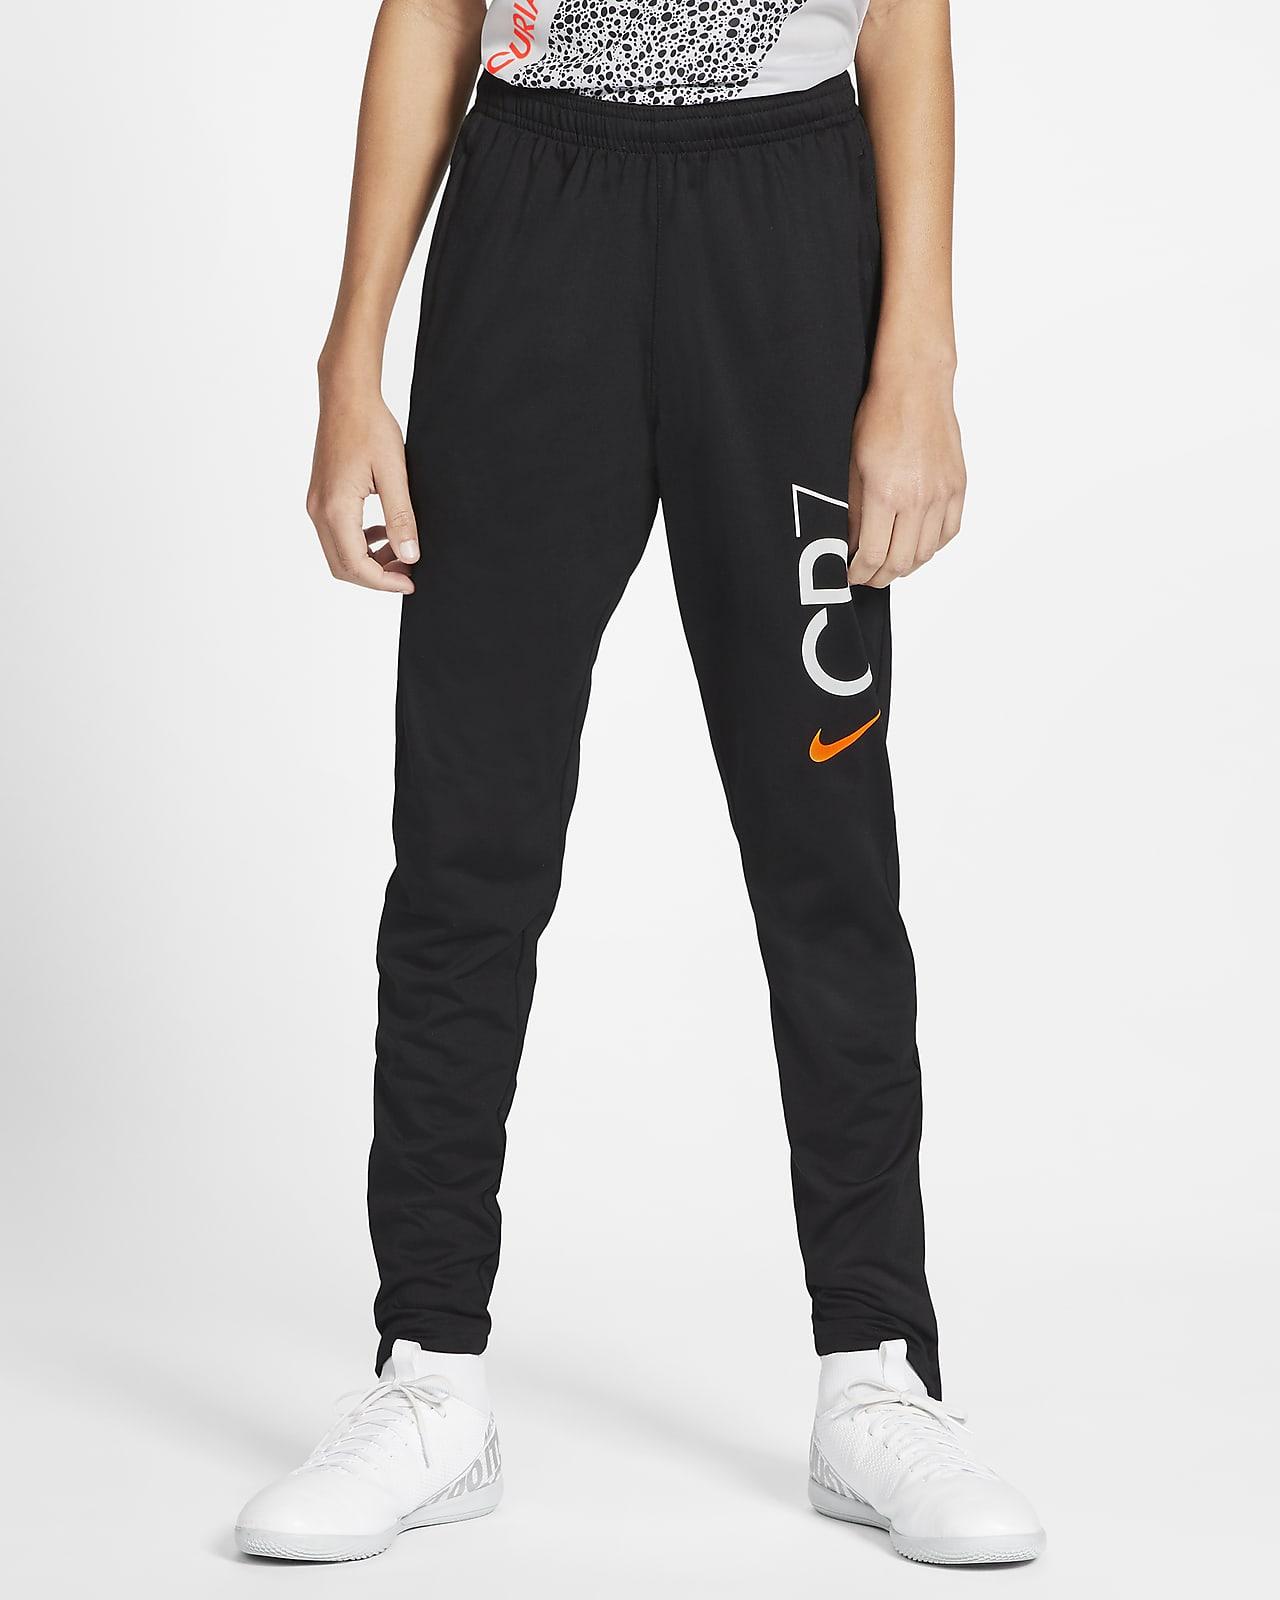 Nike Dri-FIT CR7 Fußballhose für ältere Kinder